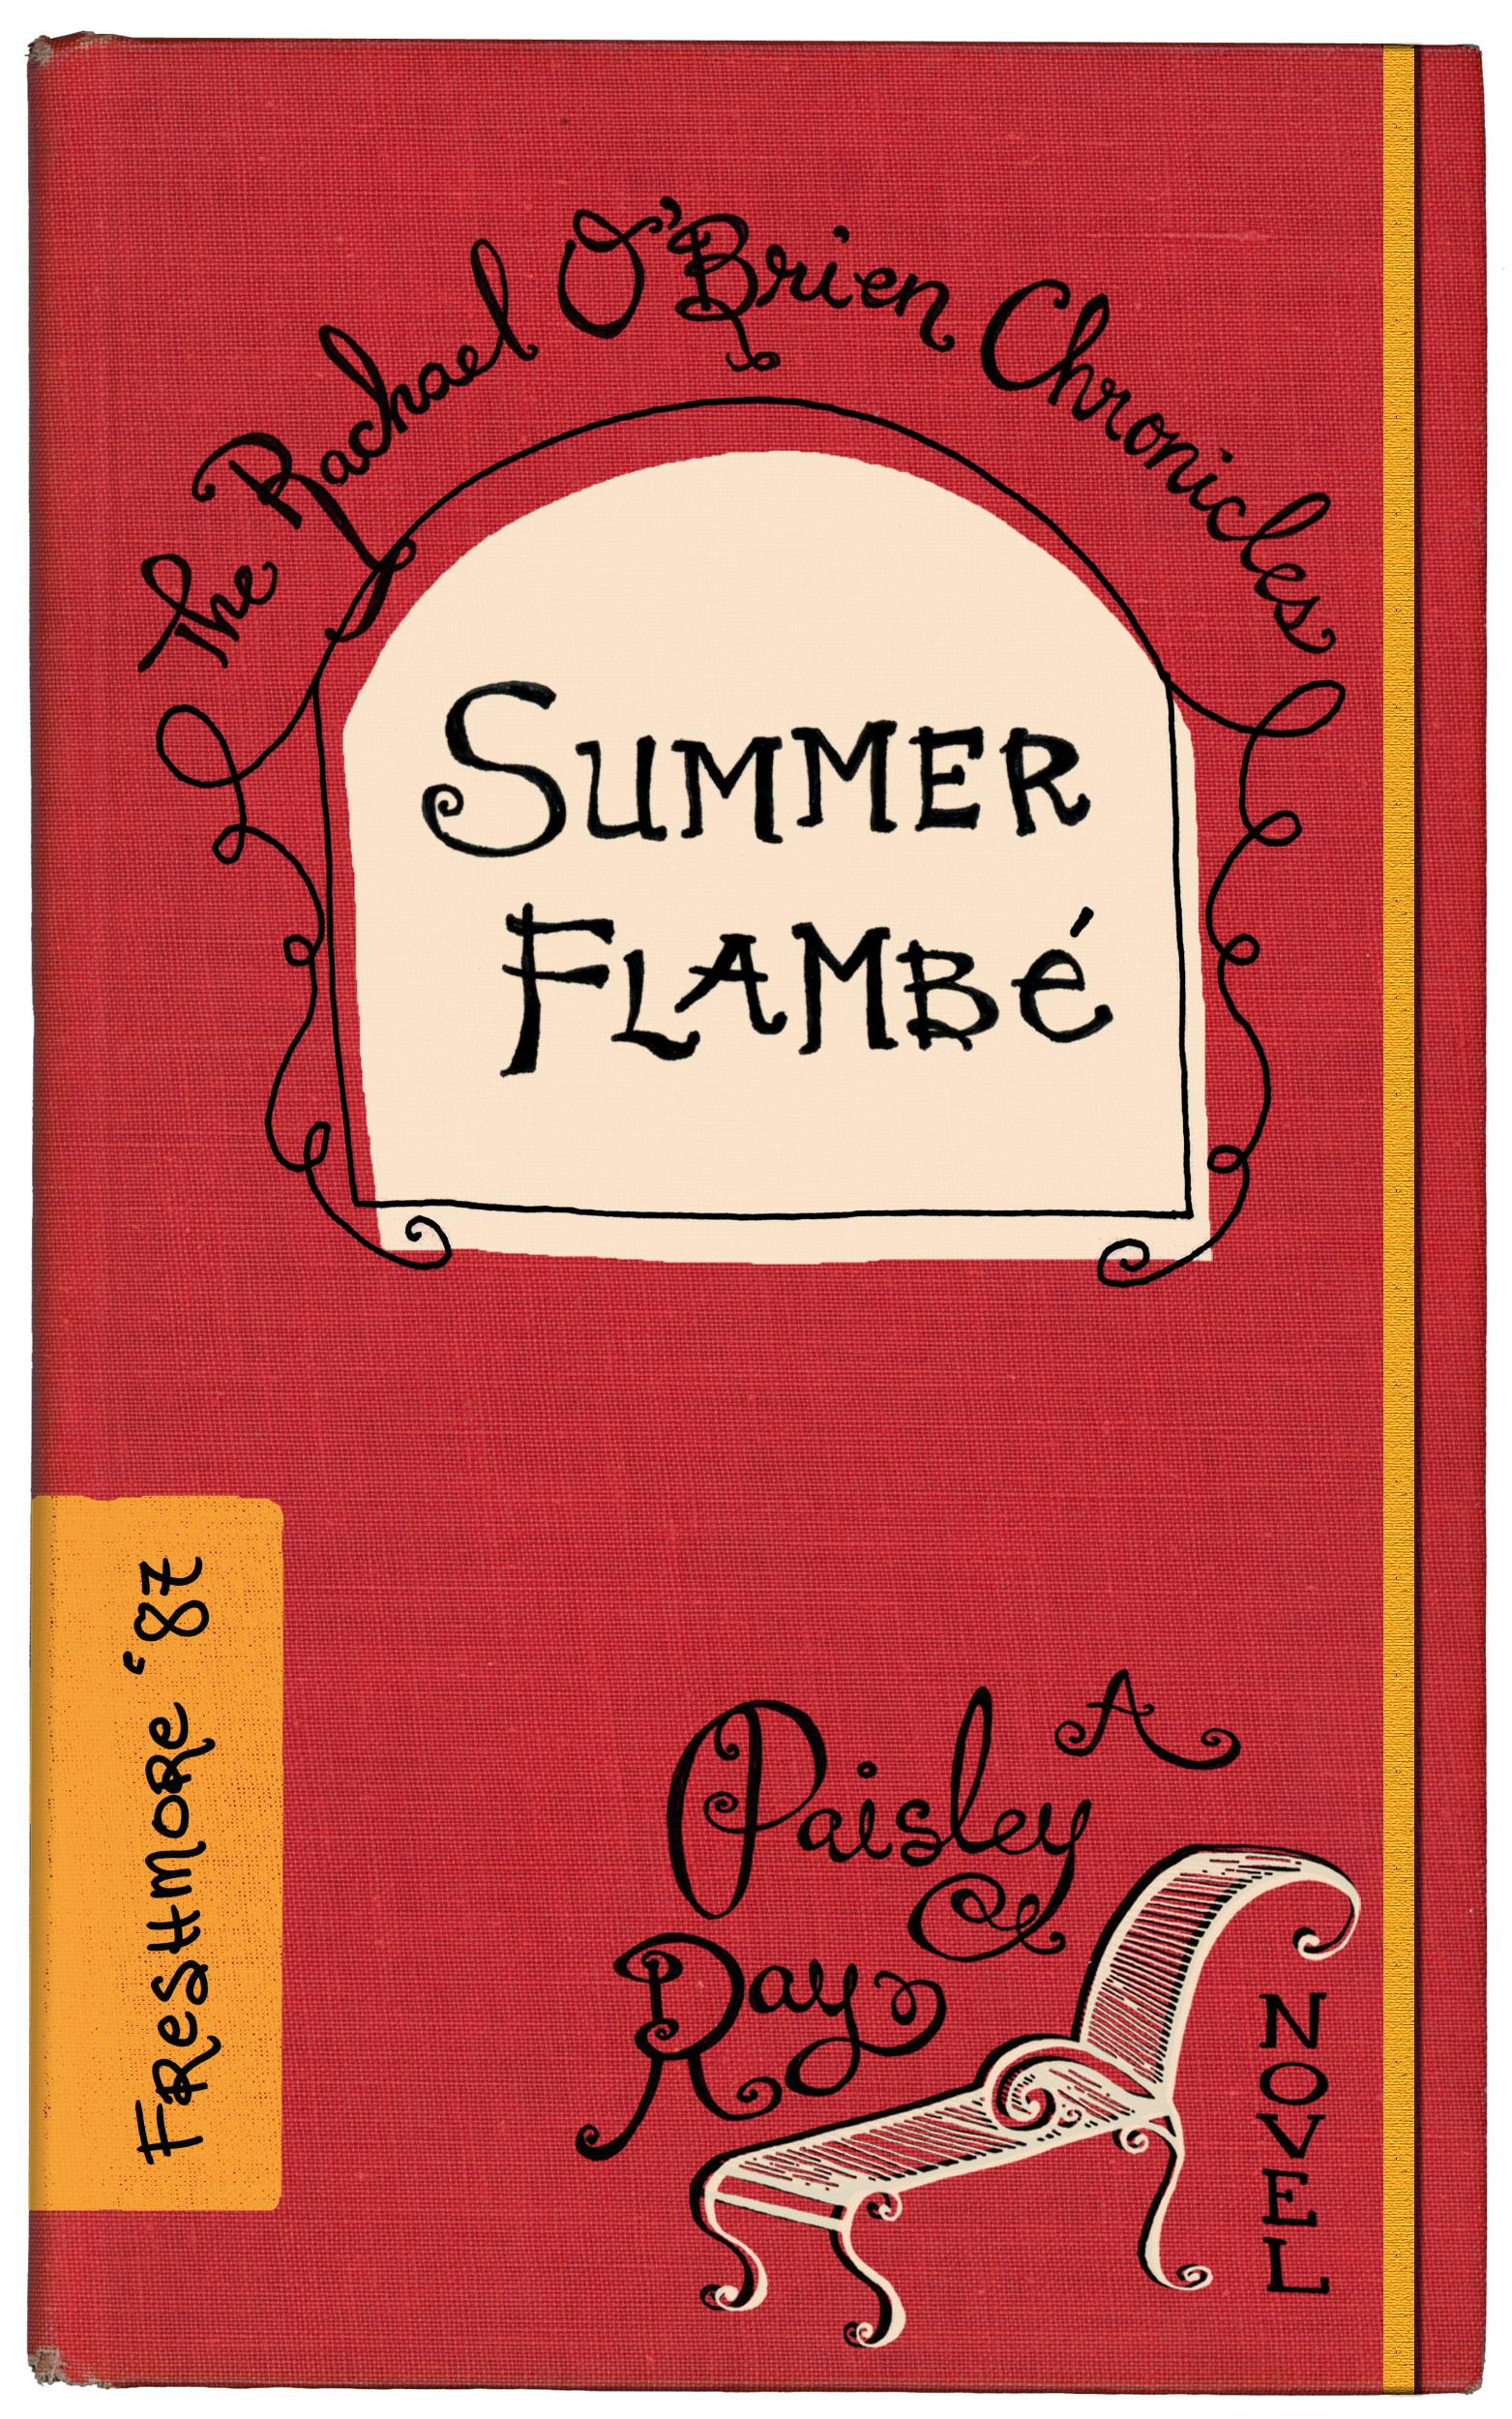 Summer Flambe mystery book